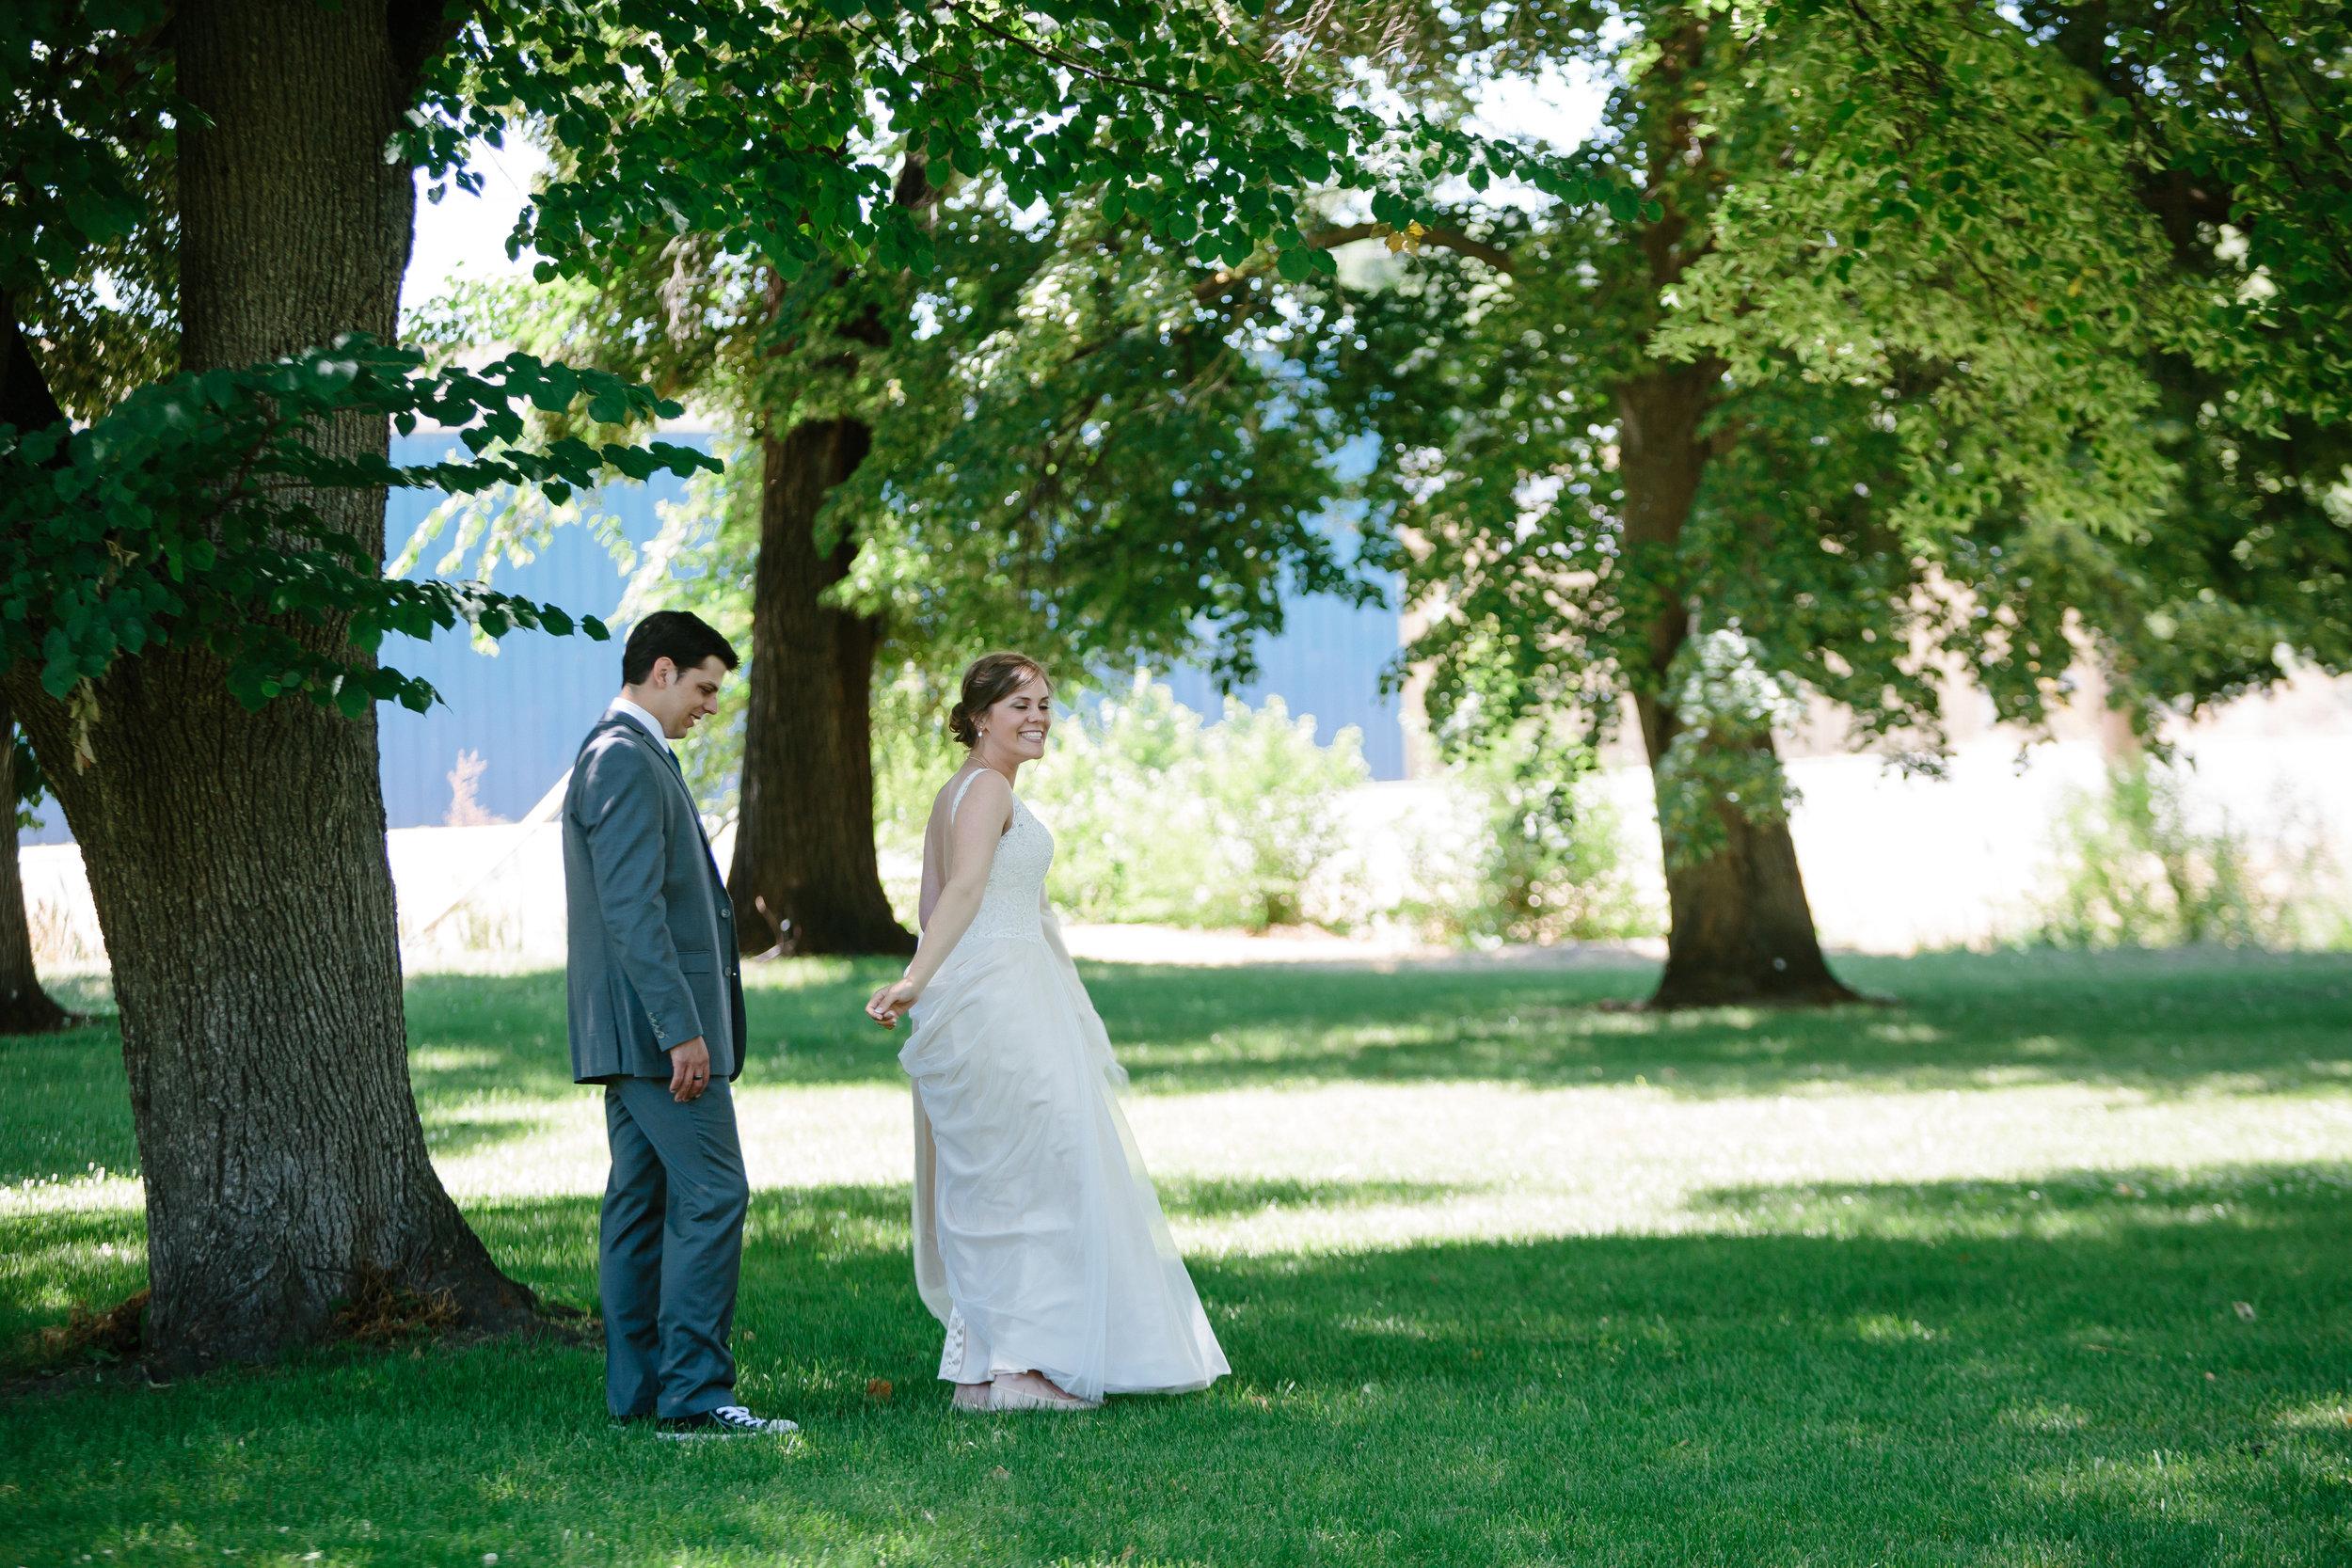 Jordan & Shantel Married - Idaho - Corrie Mick Photography-82.jpg